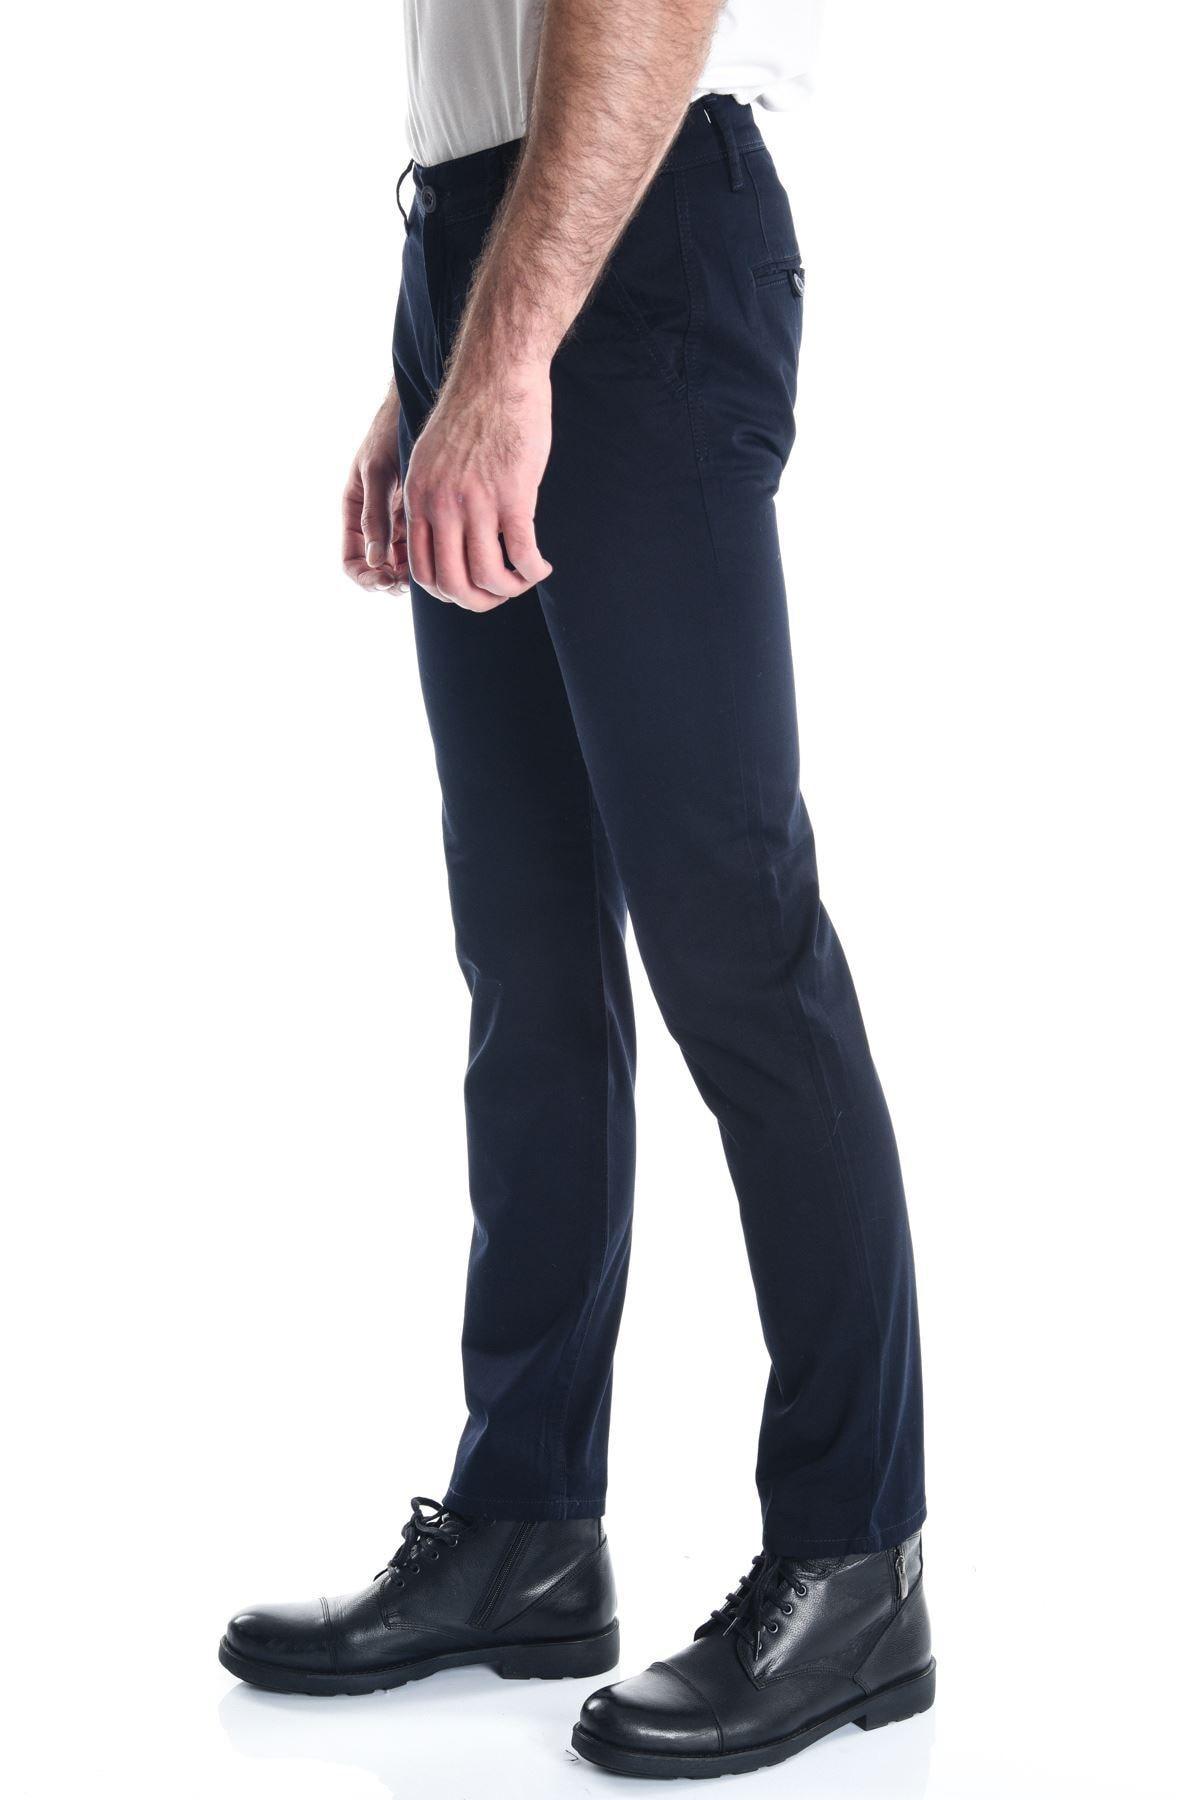 LTC Jeans Lacivert Chino Slimfit Erkek Pantolon 2